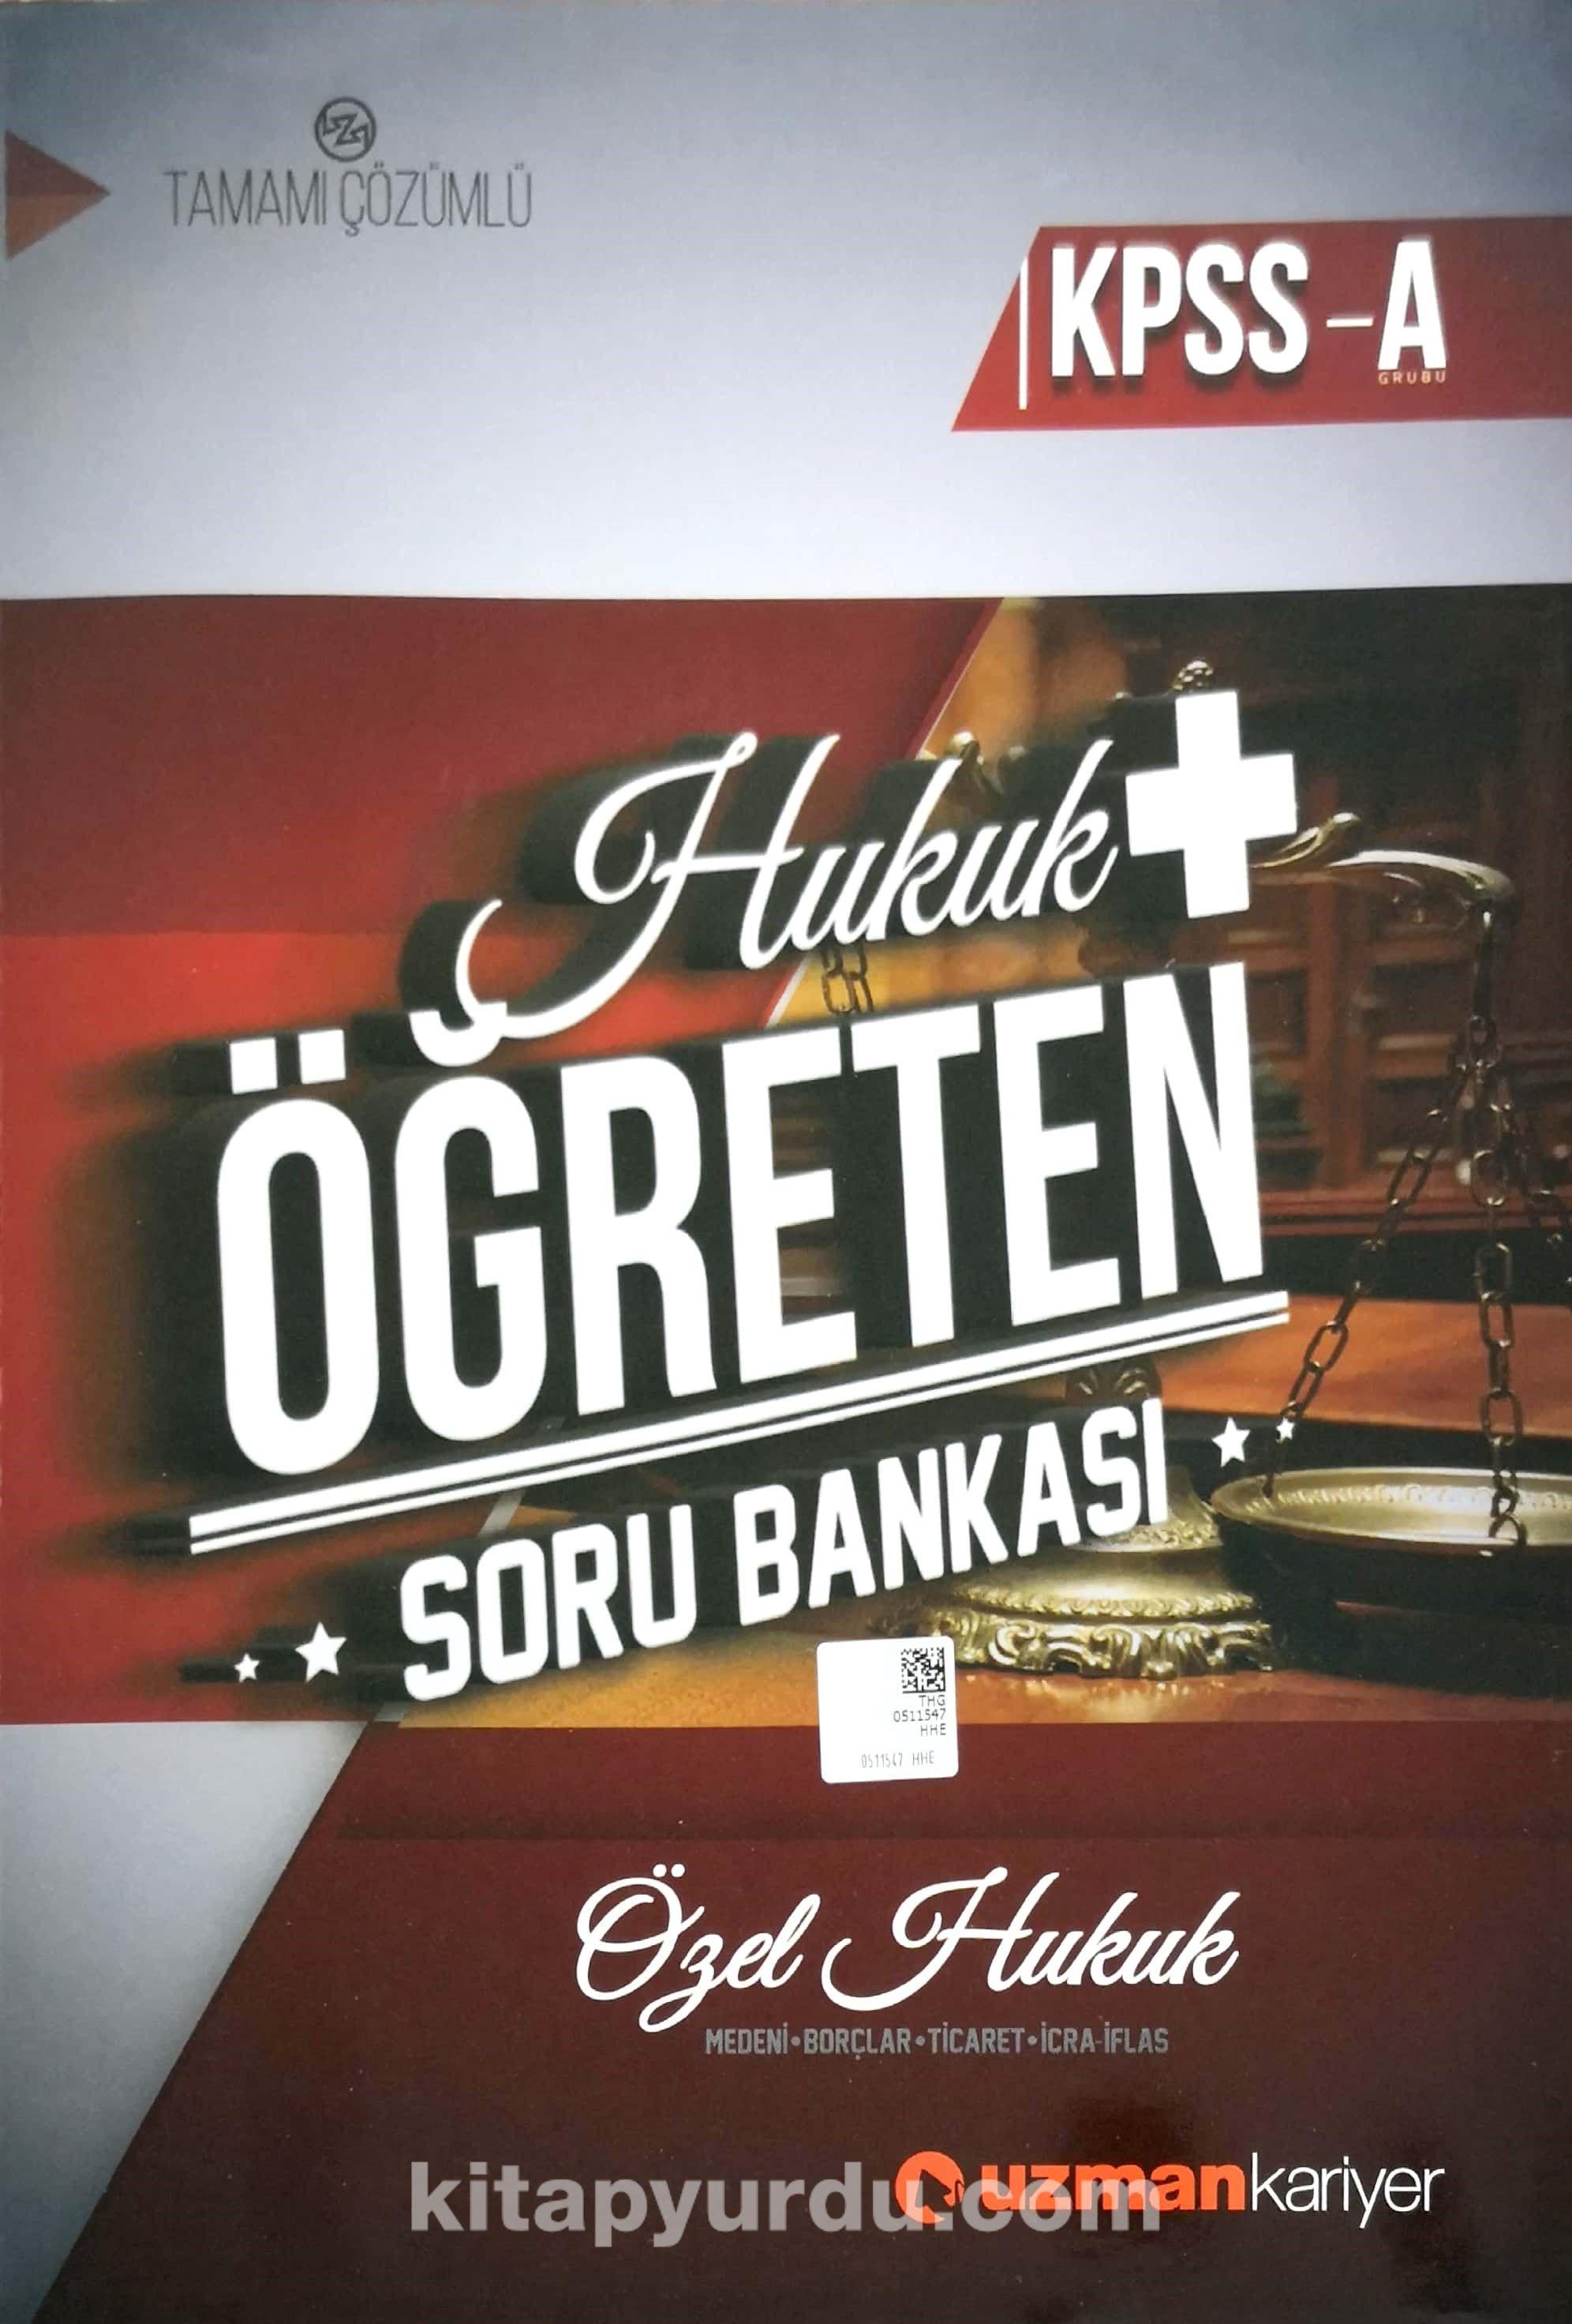 KPSS A Hukuk Öğreten Soru Bankası - Kollektif pdf epub